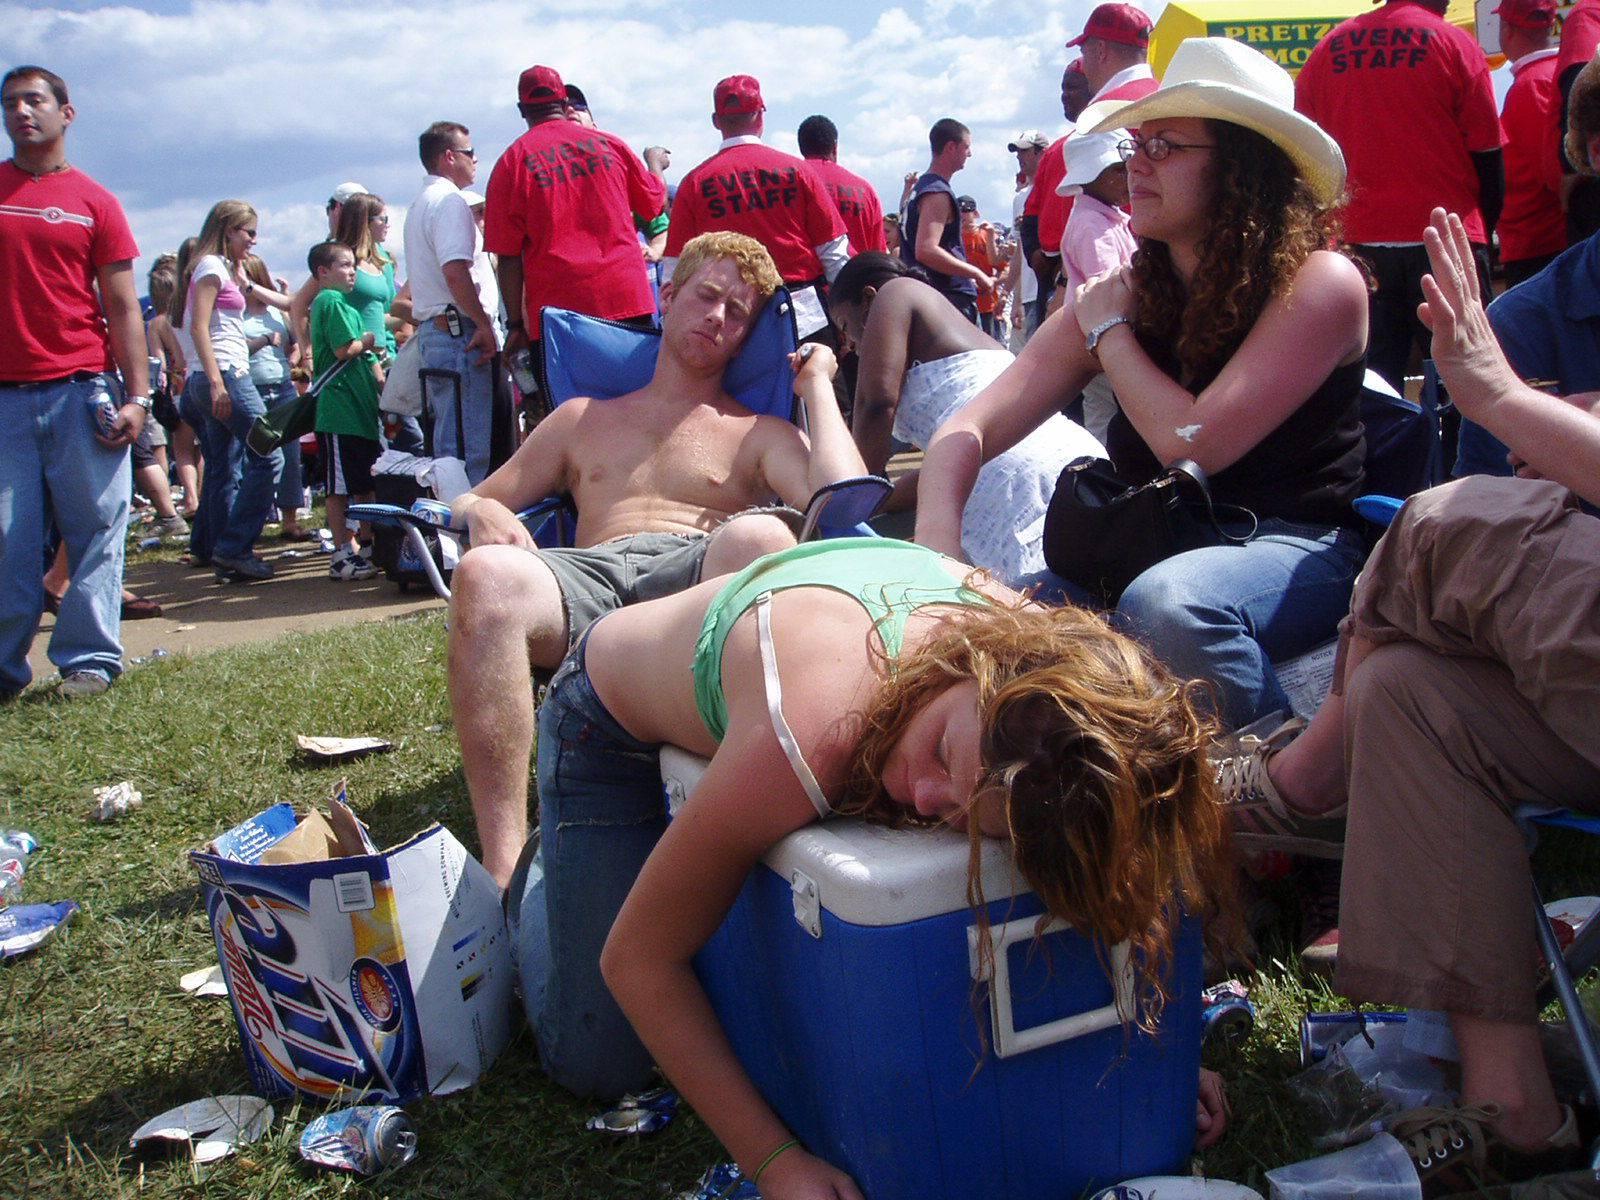 Фото с пьянок на природе 9 фотография